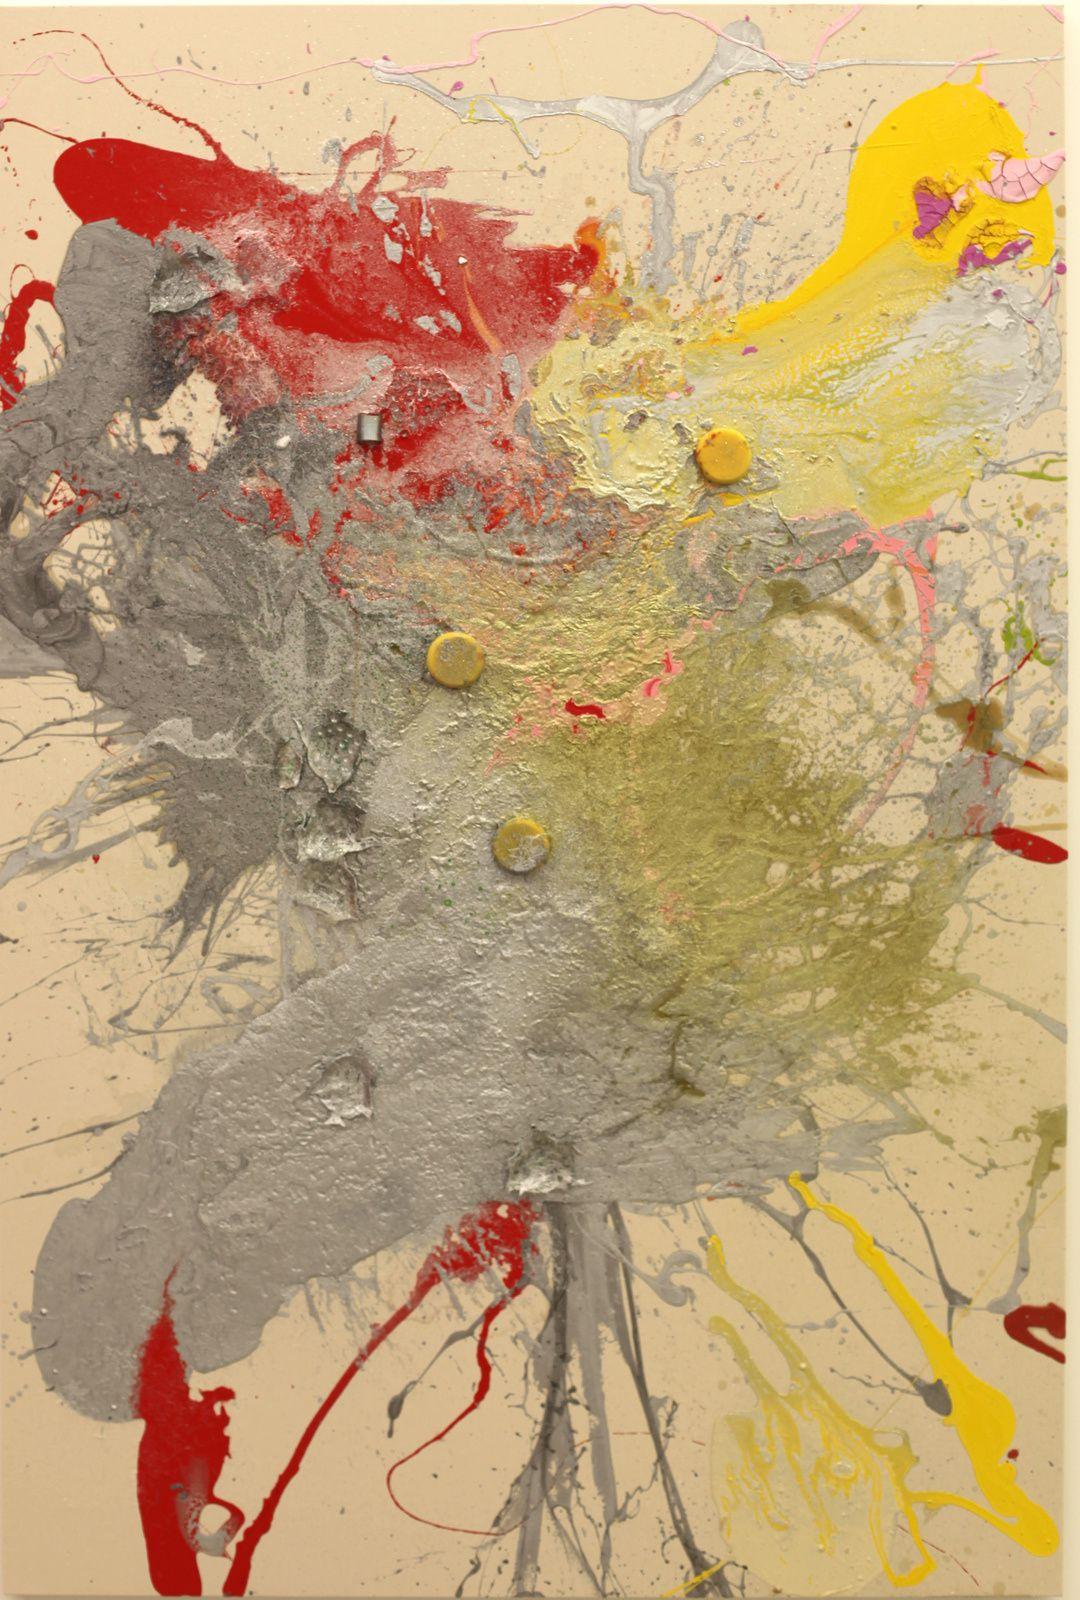 """Portails"", 2018 de John M ARMLEDER - Courtesy Galerie Almine Rech © Photo Éric Simon"